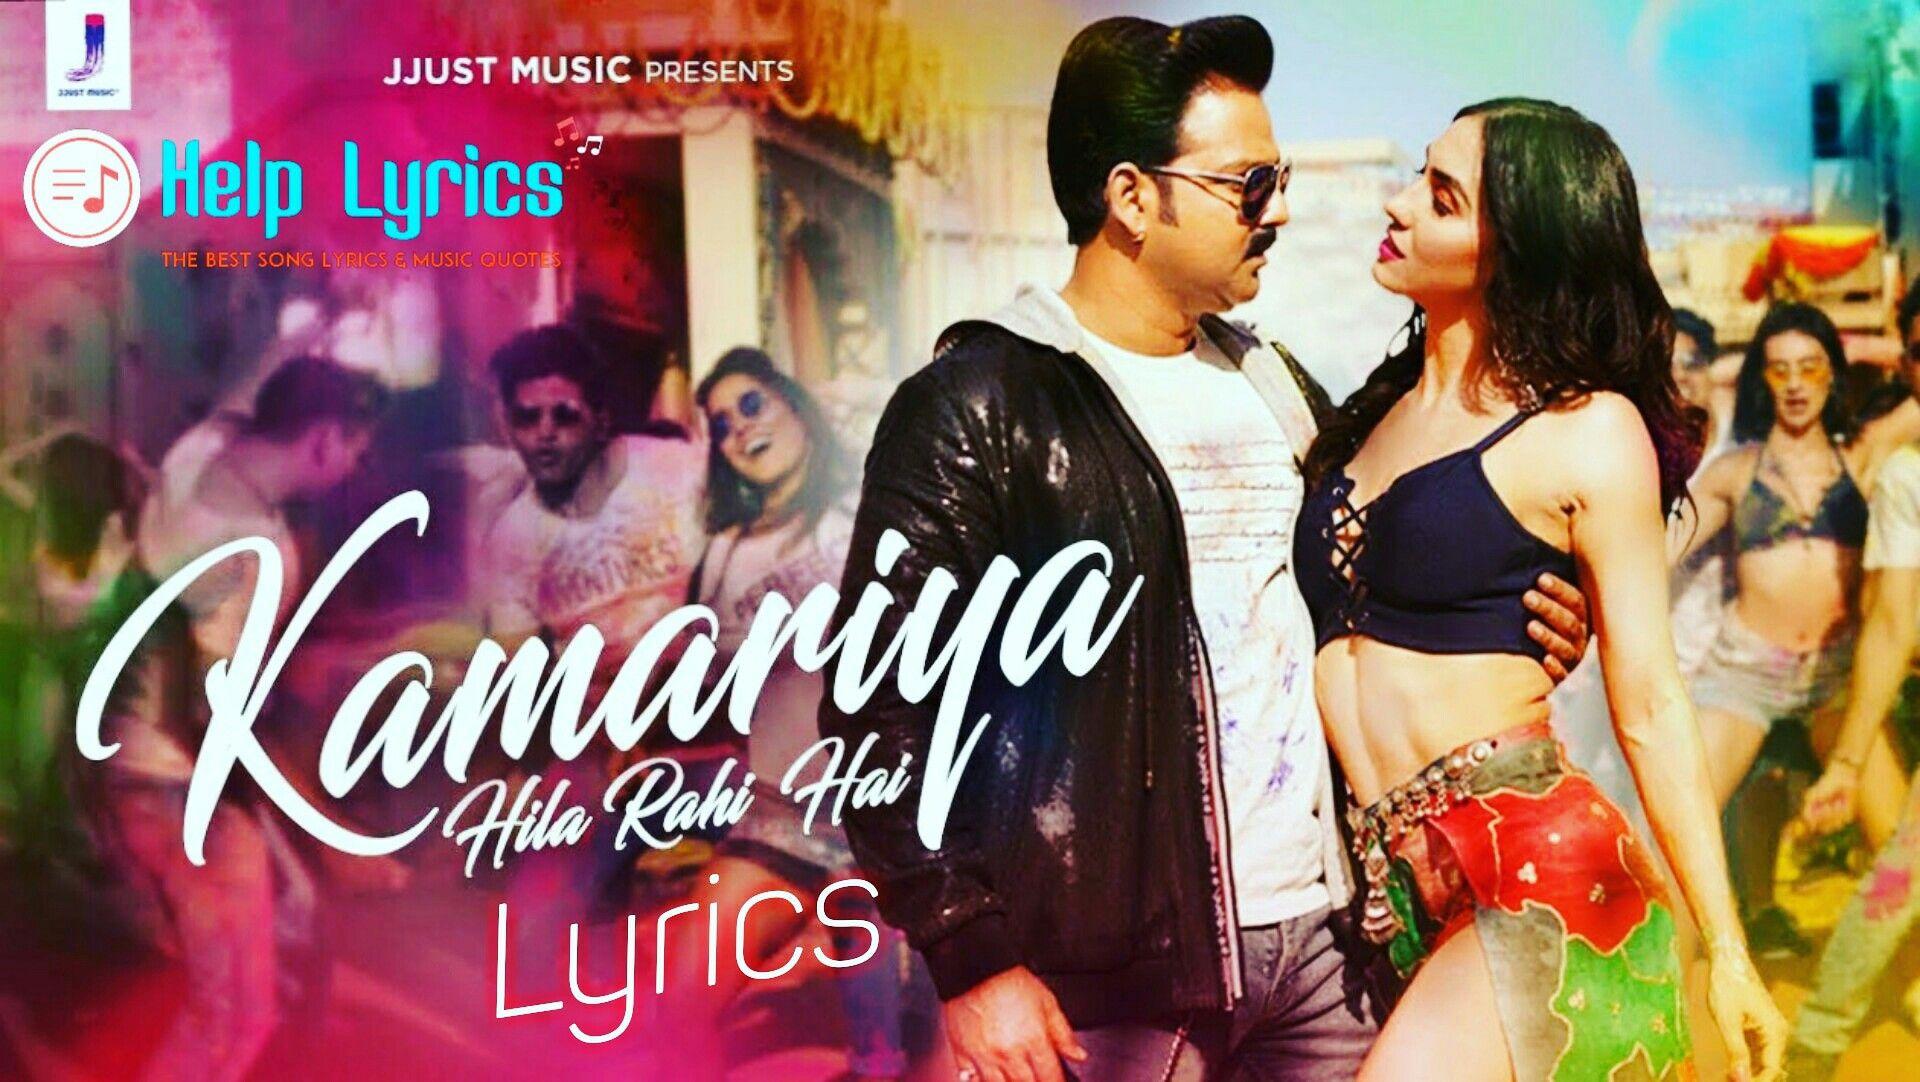 Kamariya Hila Rahi Hai Lyrics Hindi English Pawan Singh In 2020 Bollywood Movie Songs New Hindi Songs Bollywood Songs